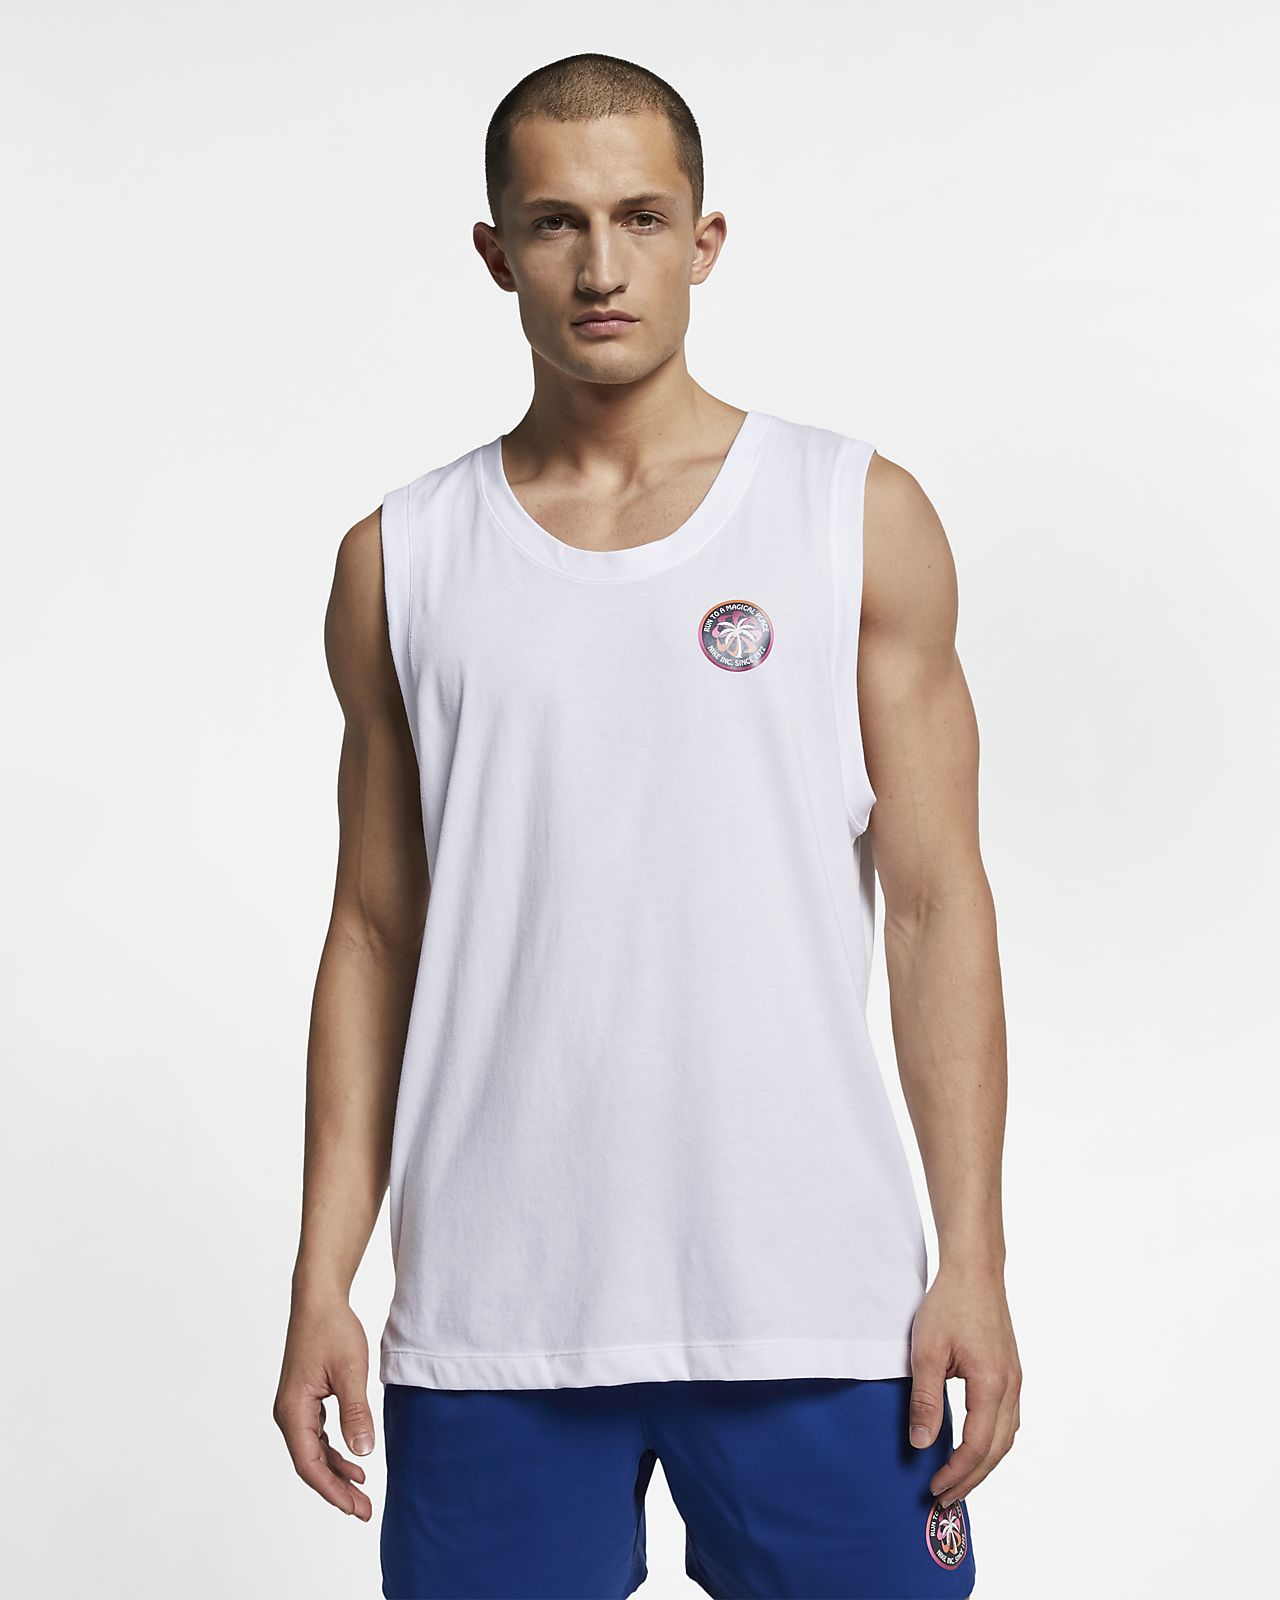 quality design 14c9e 26324 ... Nike Dri-FIT Men s Running Tank